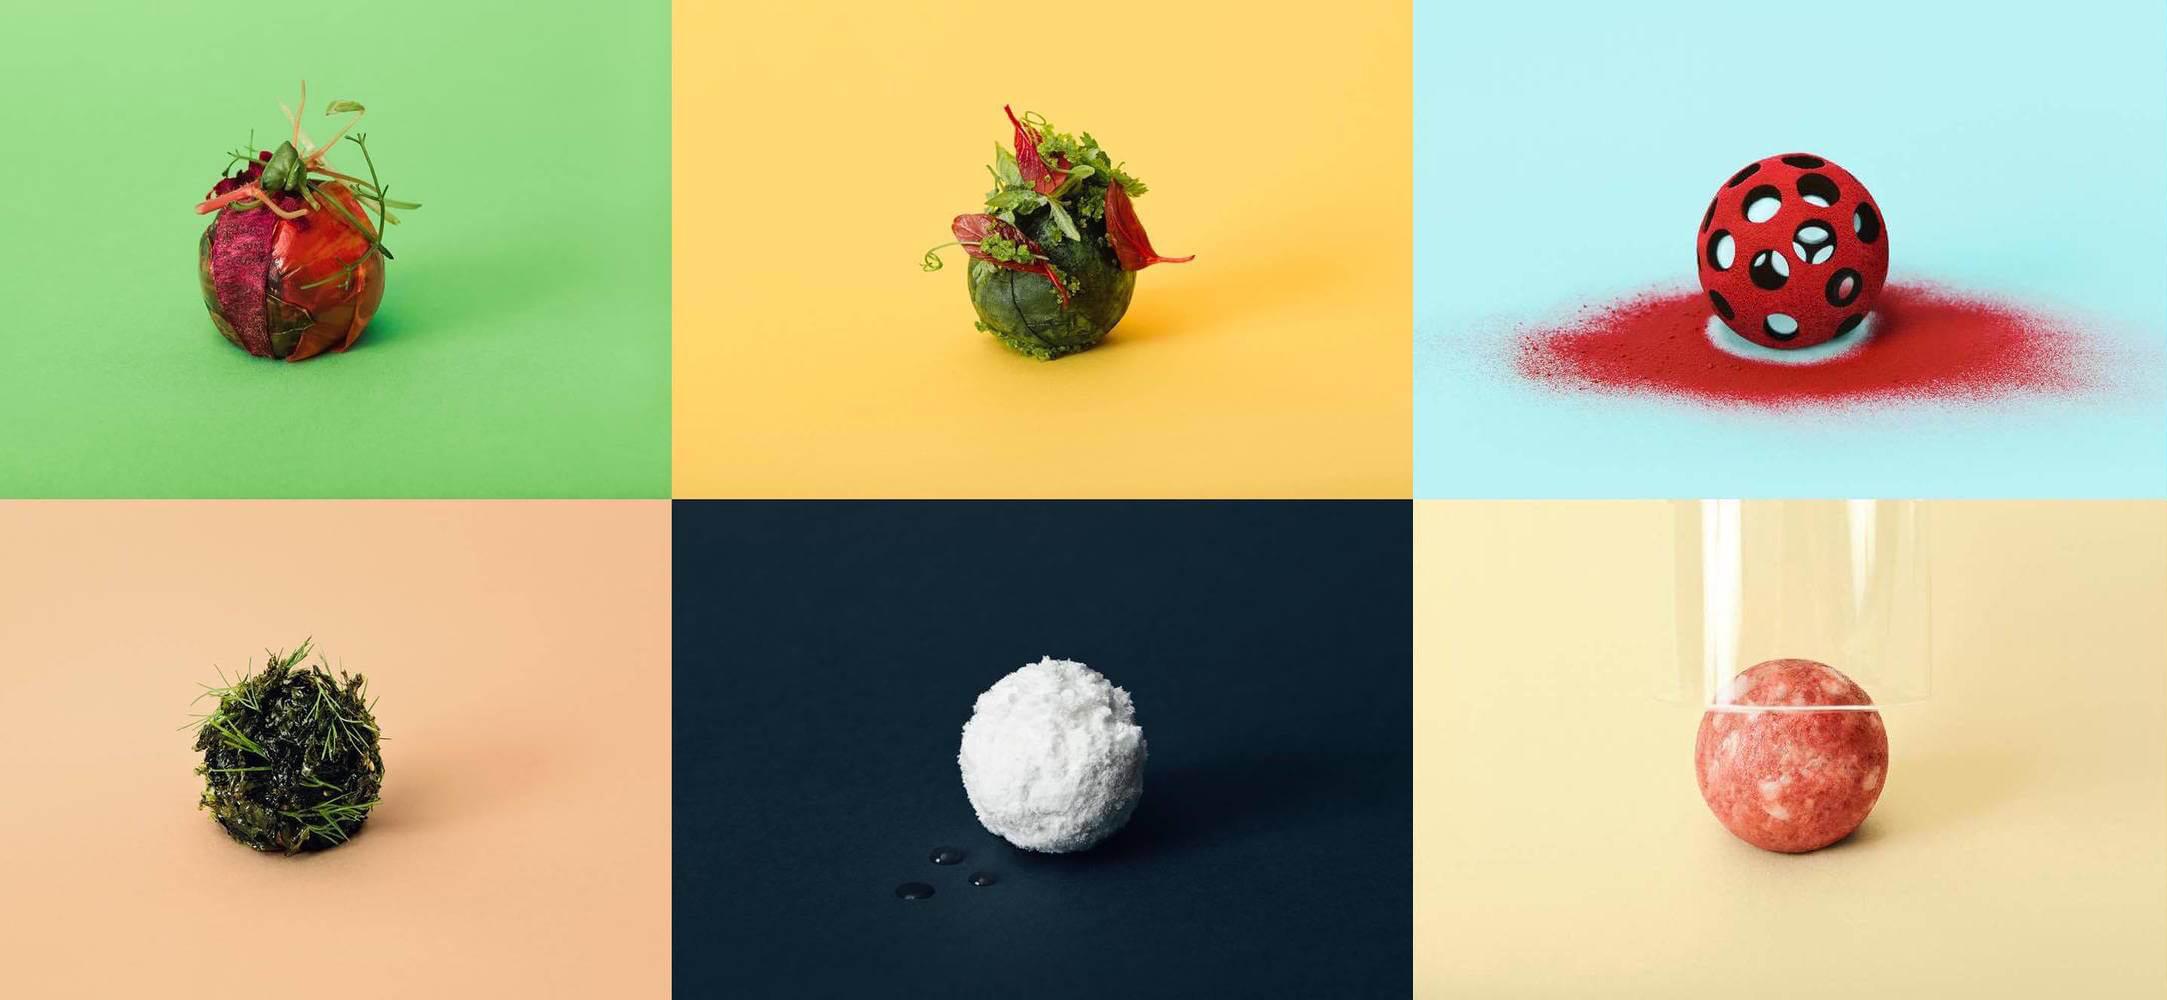 ikea-boulette-food-futur-banniere